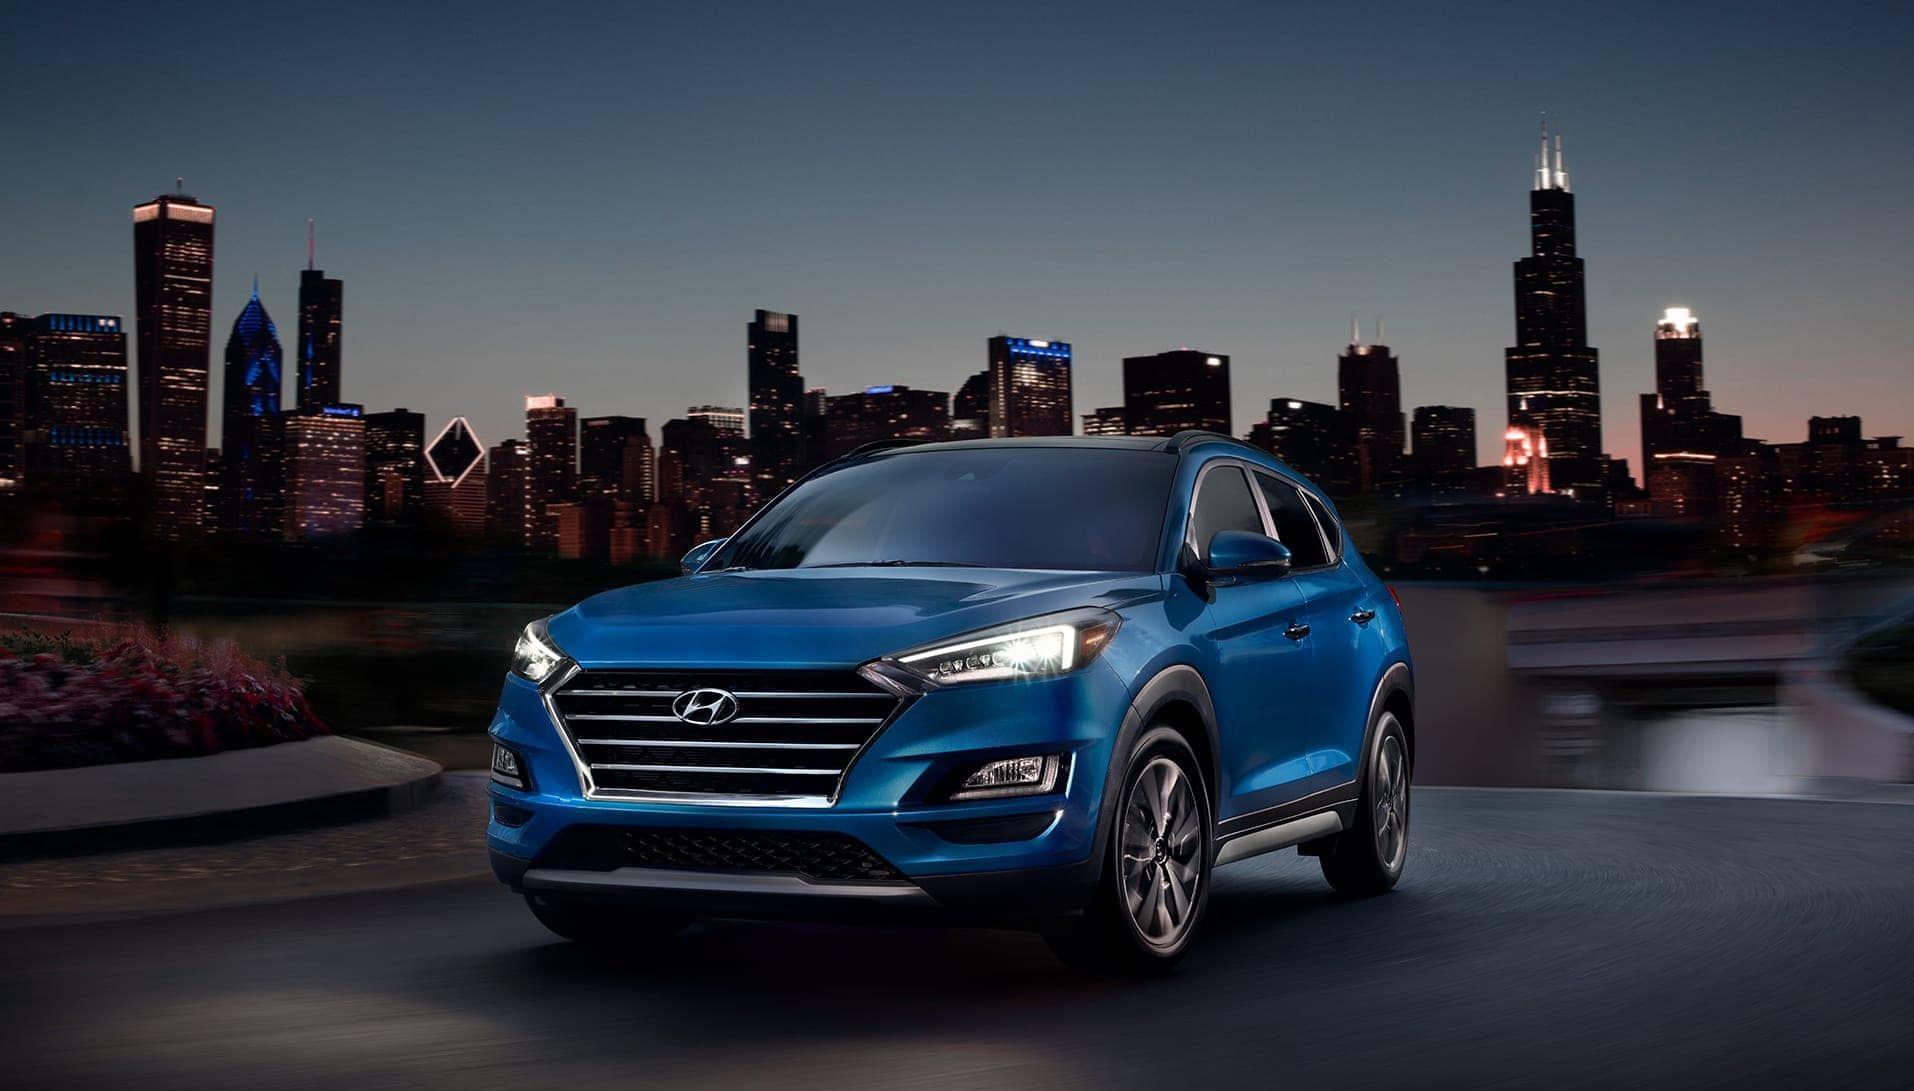 2019 Hyundai Tucson Leasing near Stafford, VA